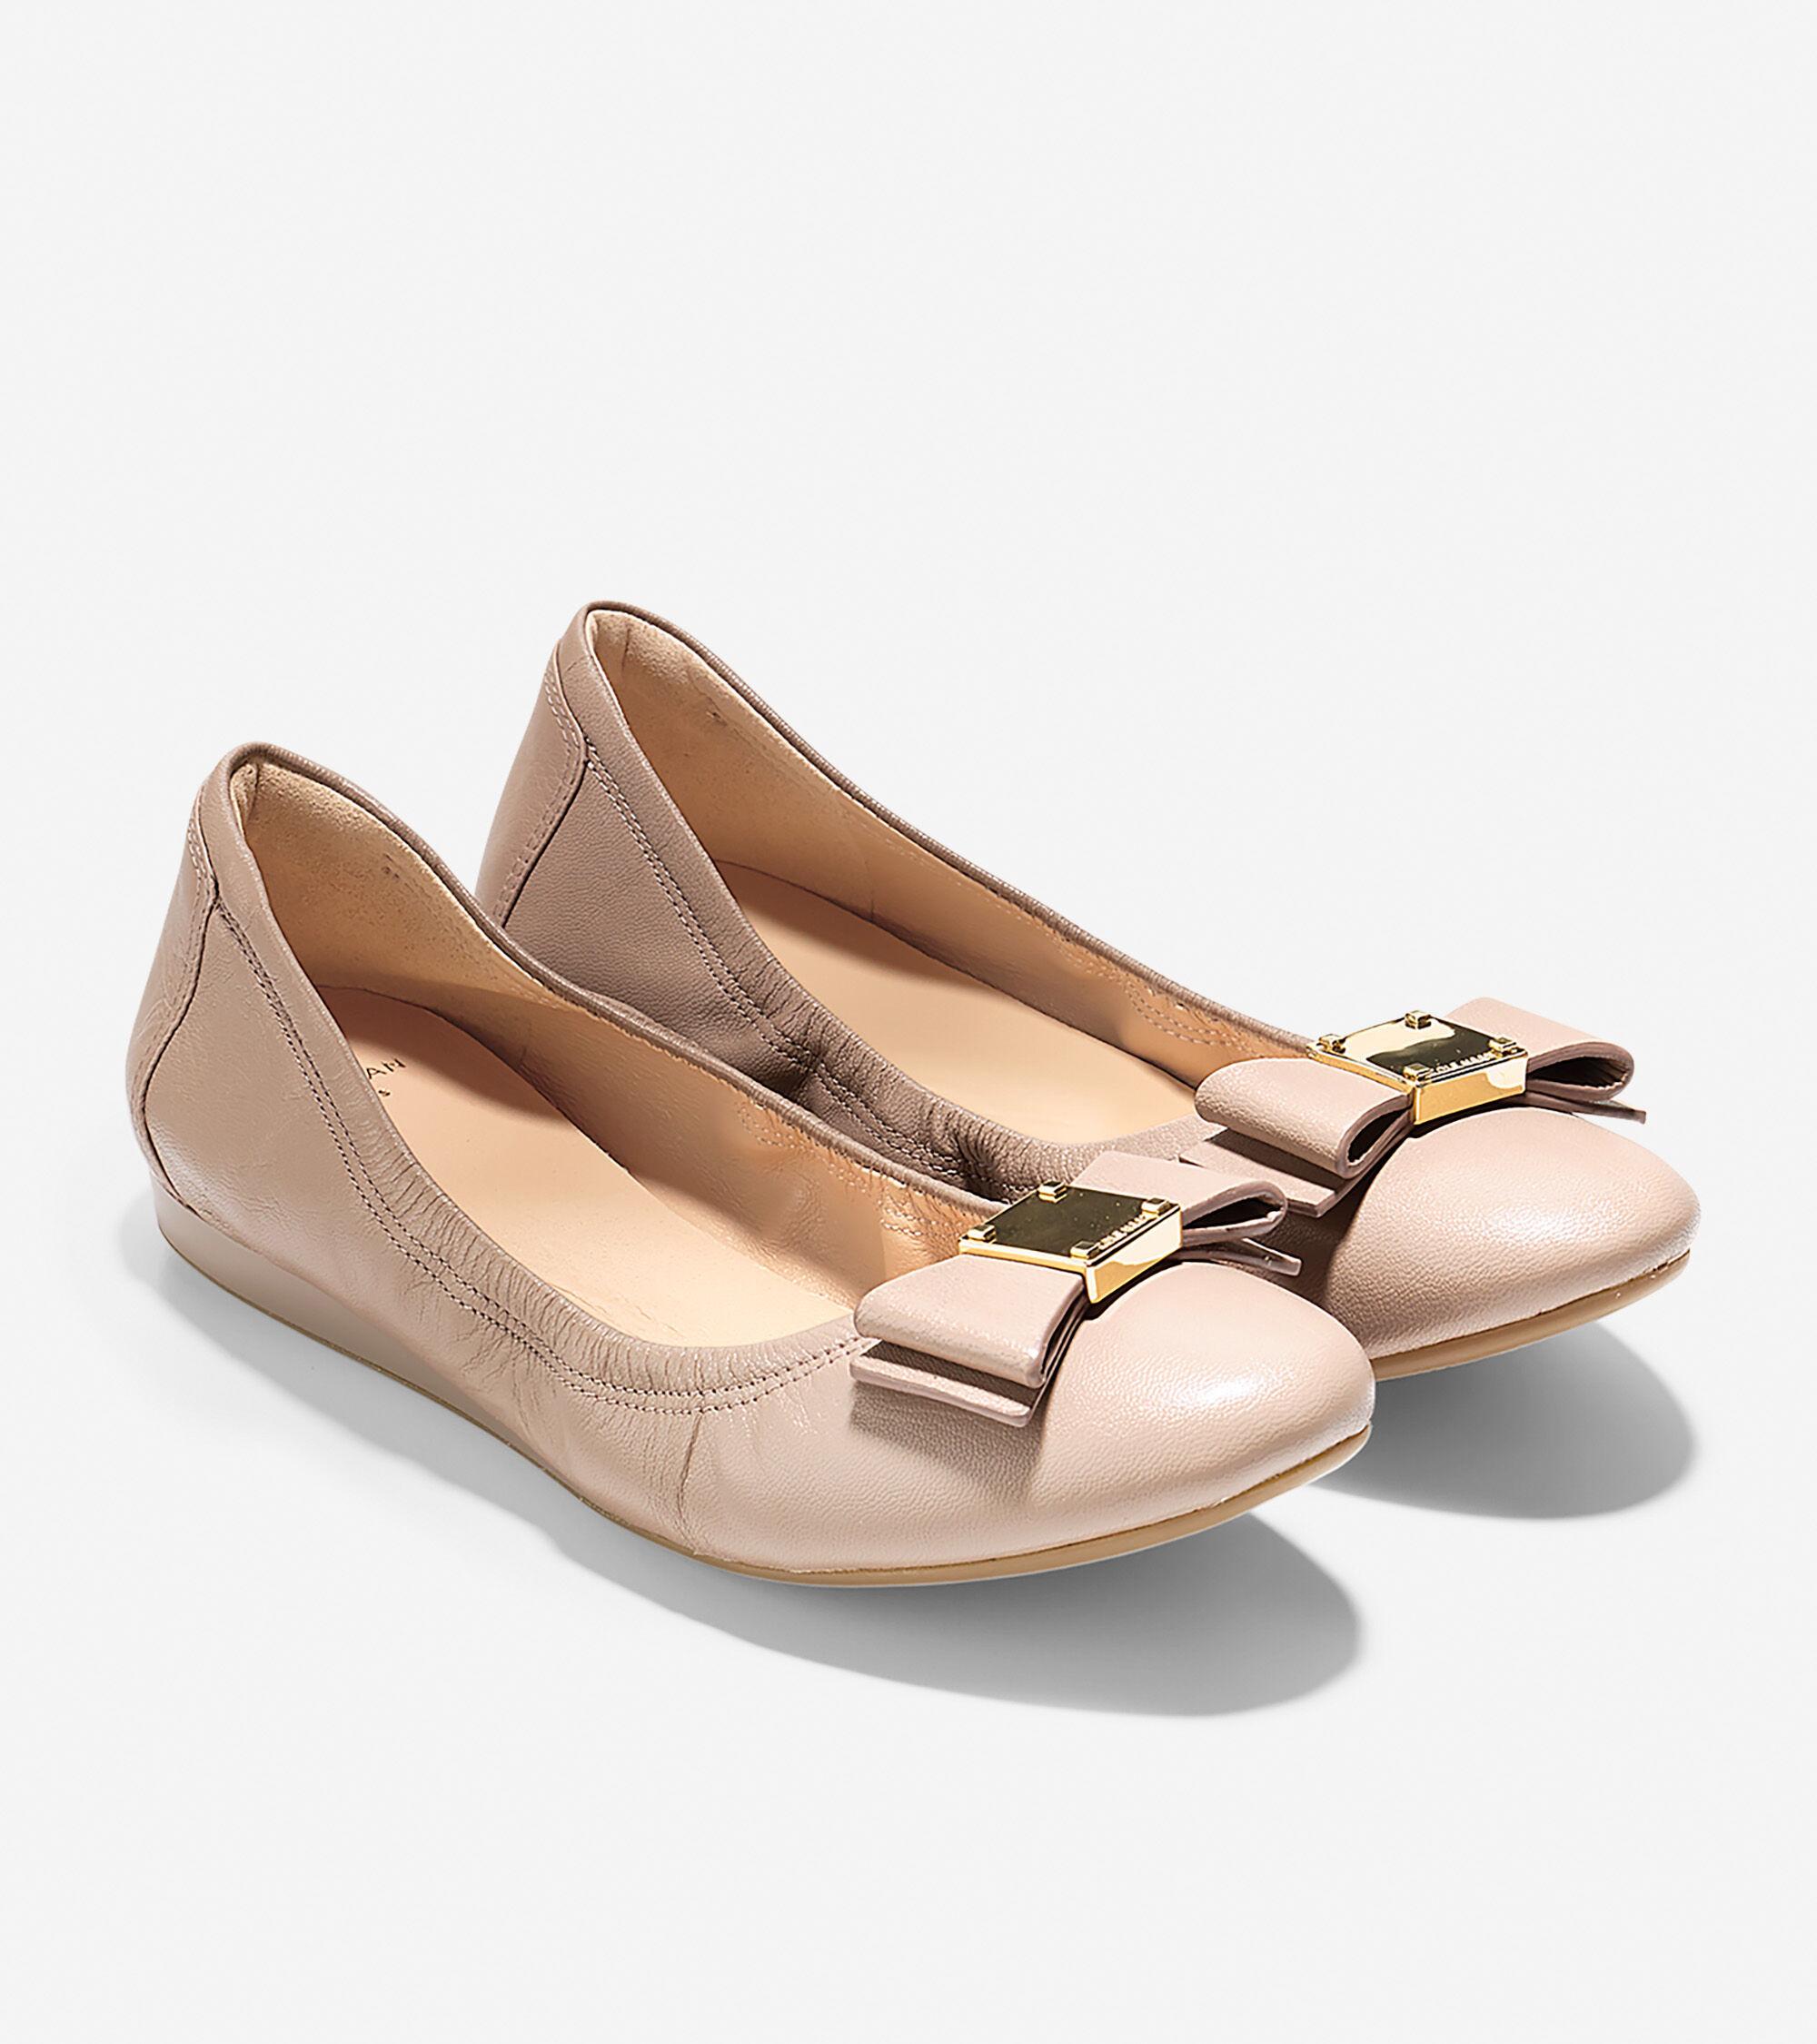 Cole Haan Tali Bow Ballet Flat (Women's) UZP3PeFG3B